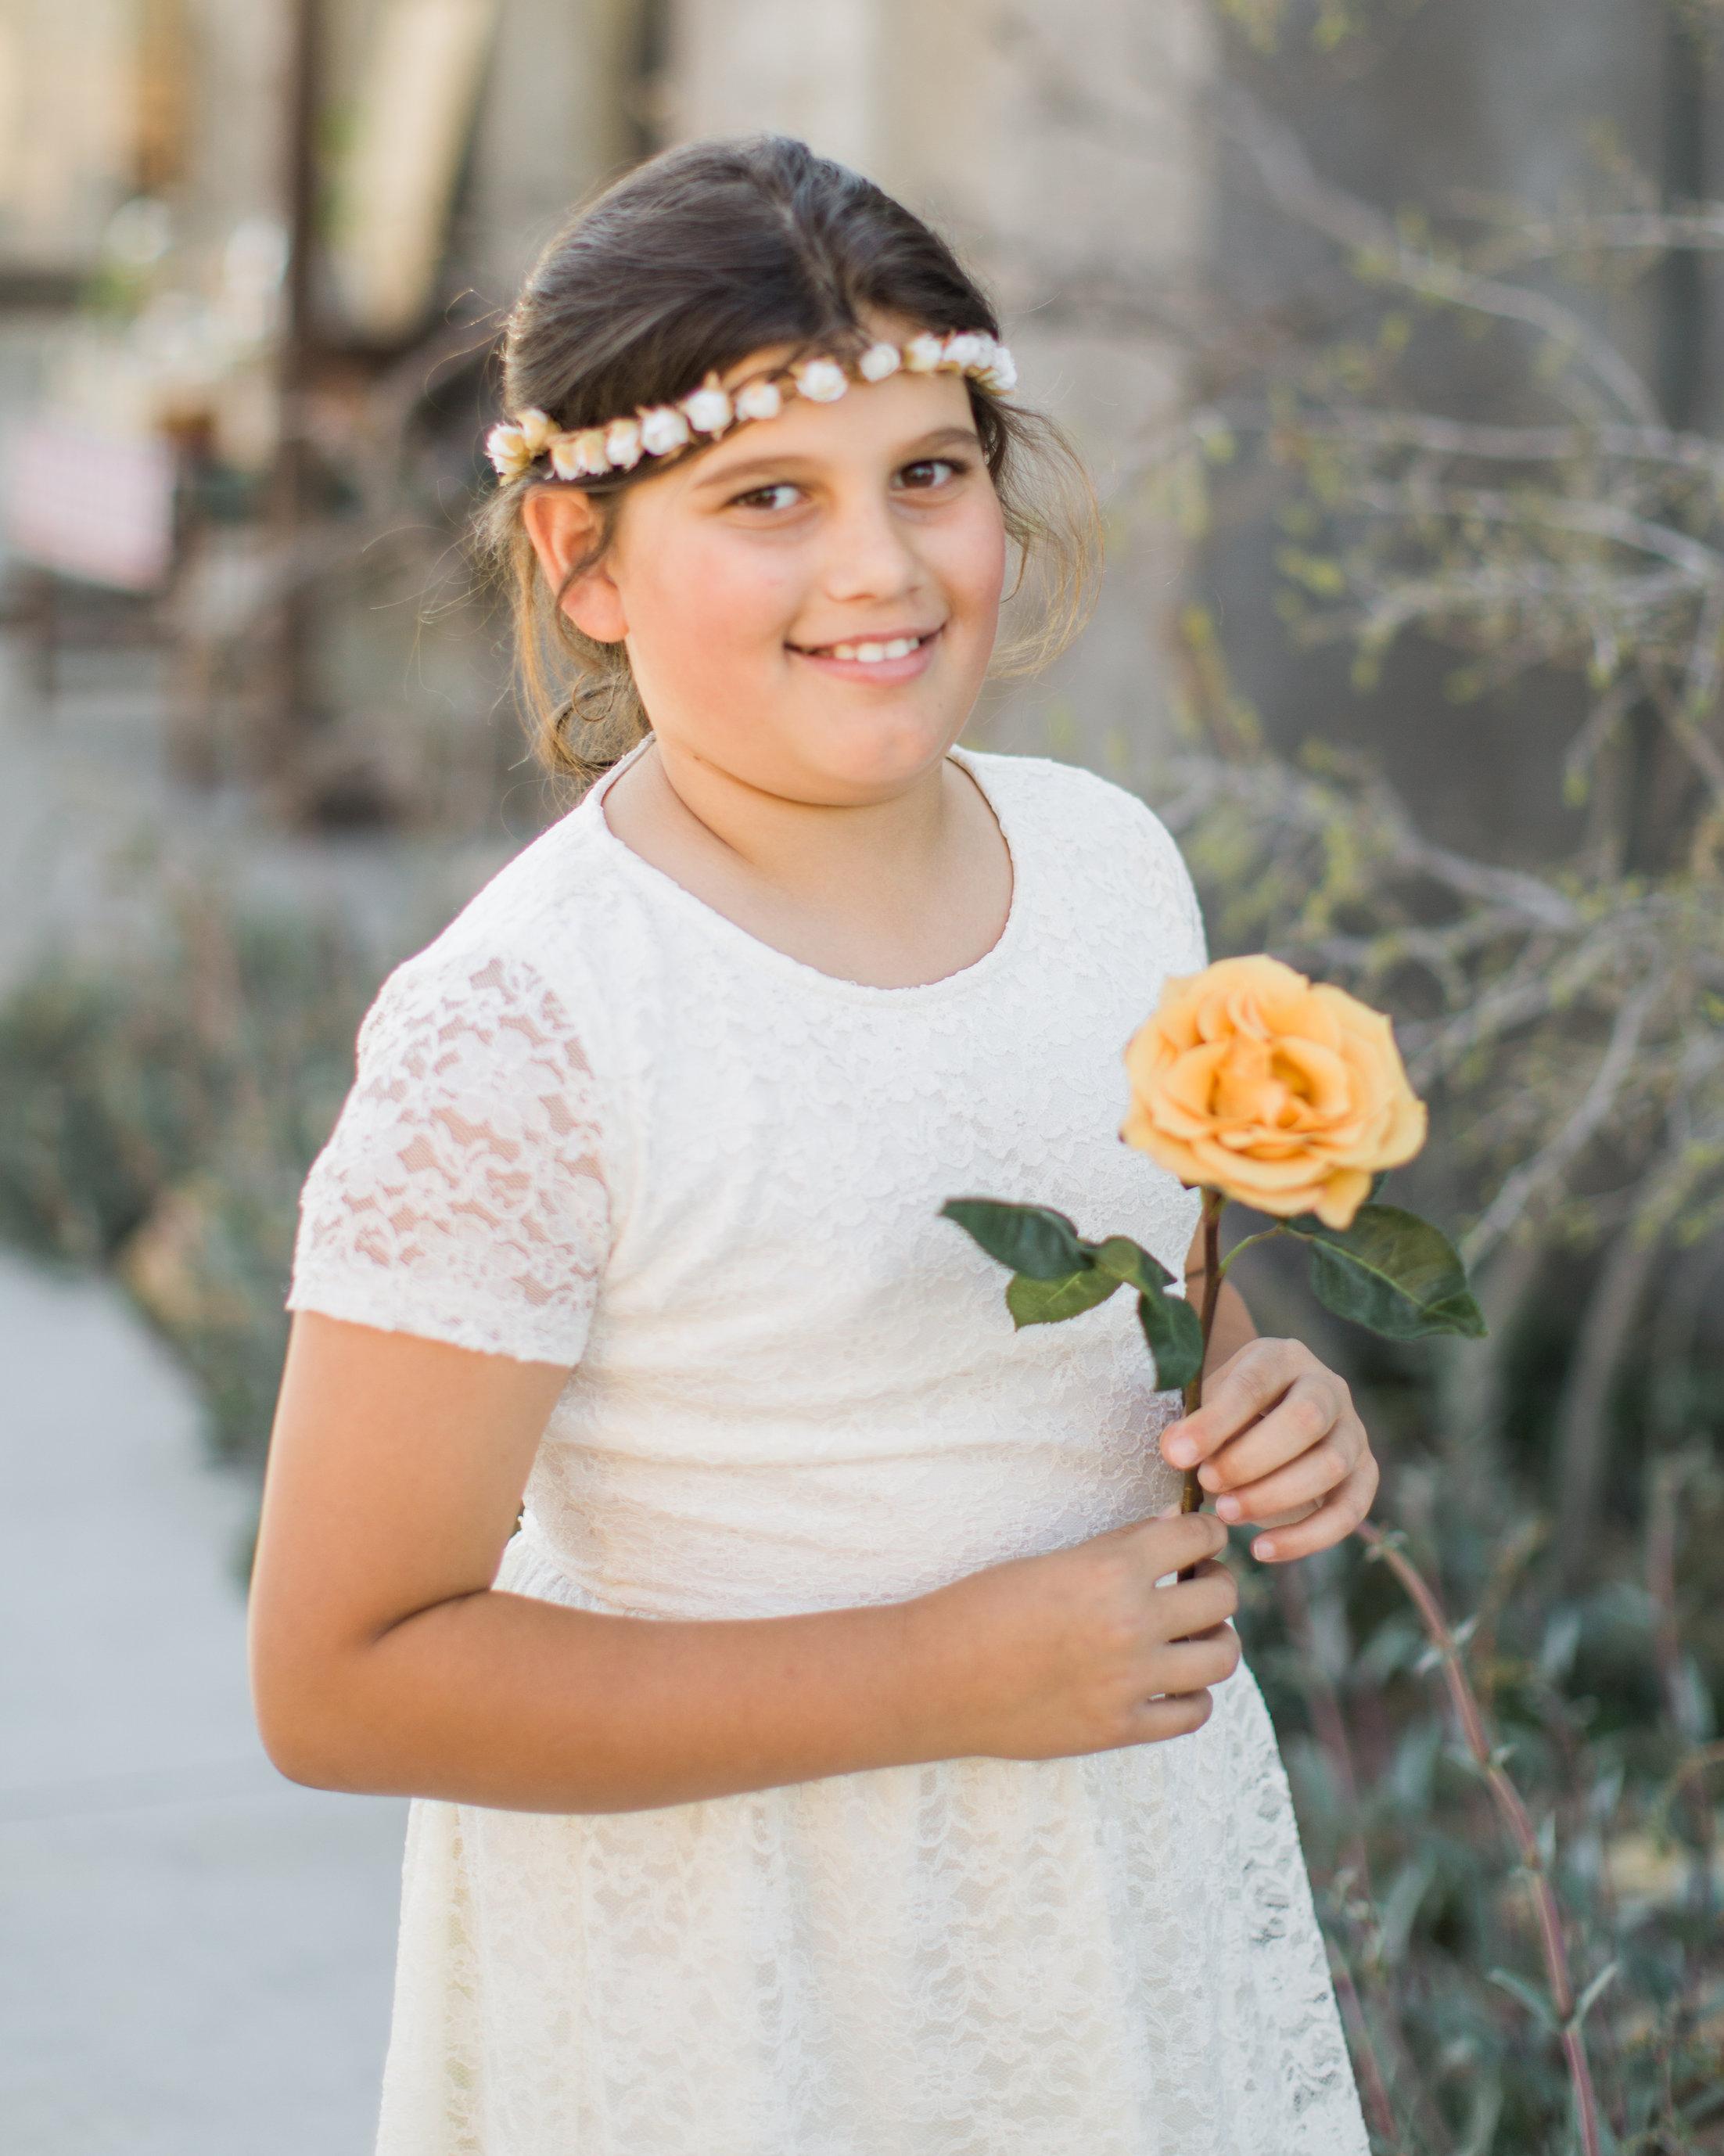 lara-chad-wedding-flowergirl-369-s112306-1115.jpg